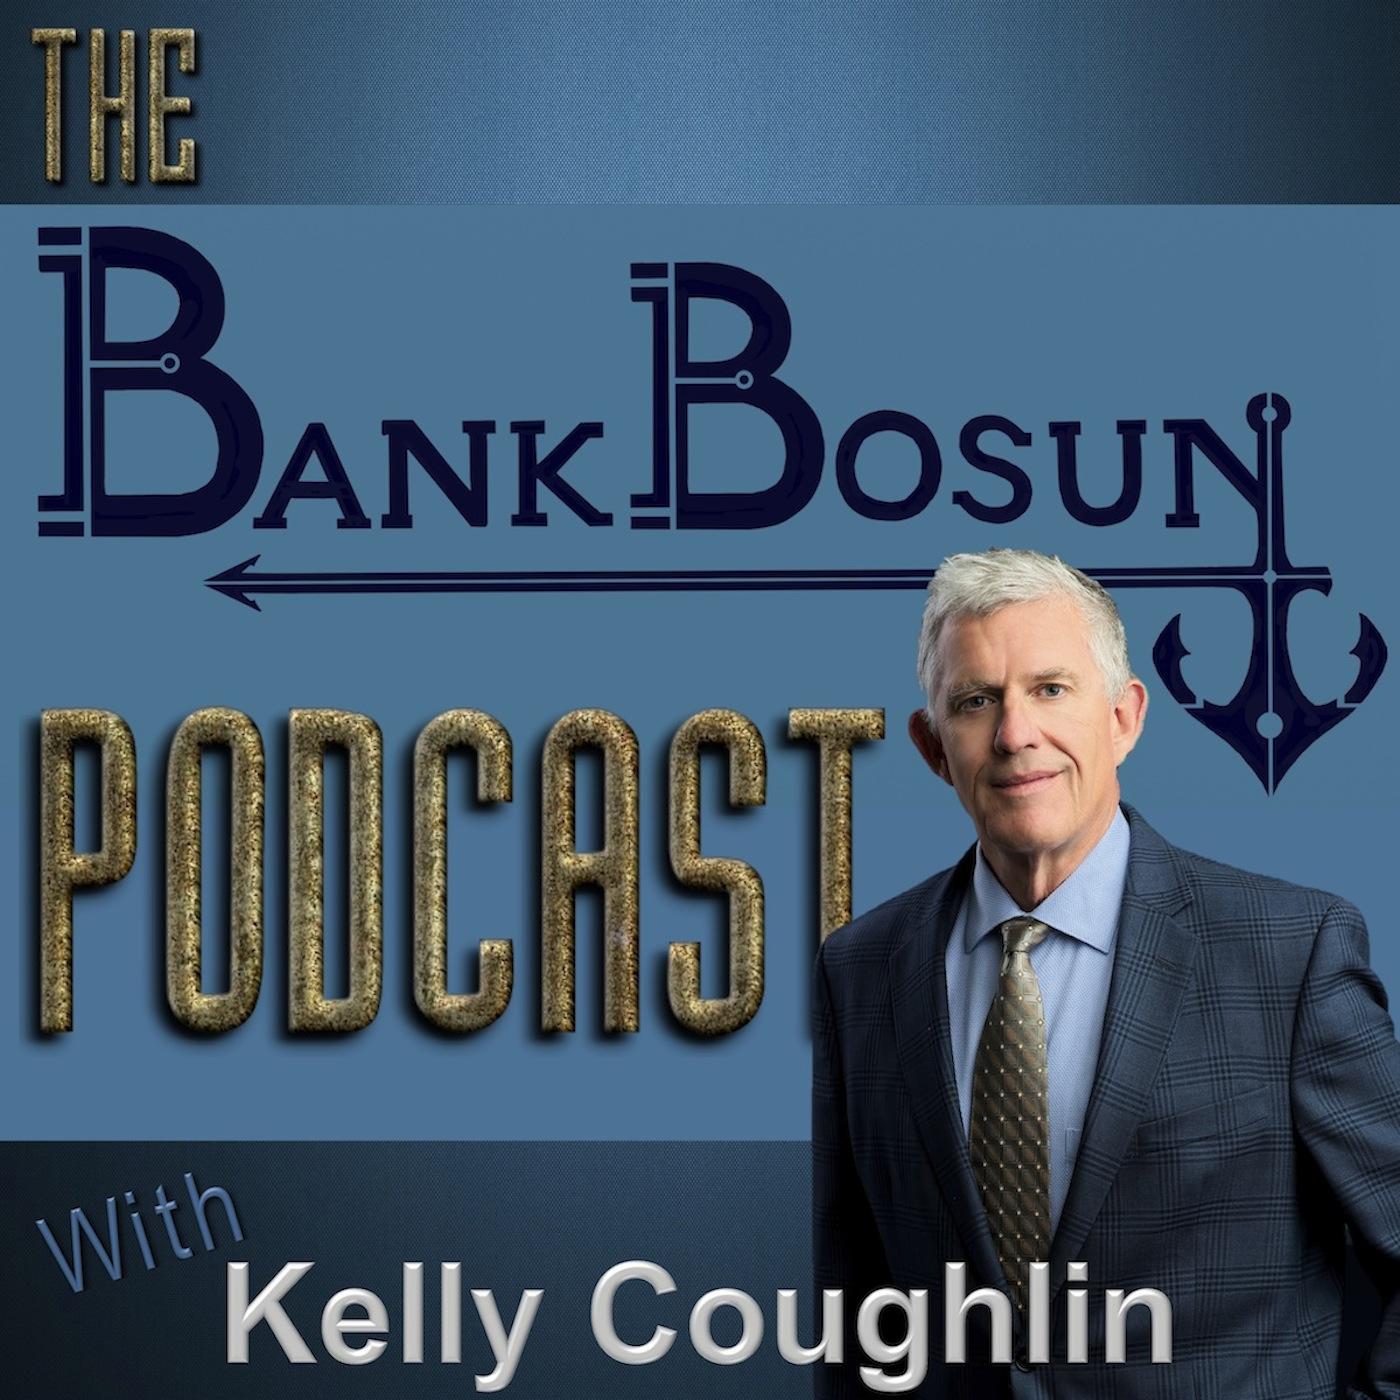 BankBosun Podcast | Banking Risk Management | Banking Executive Podcast show art